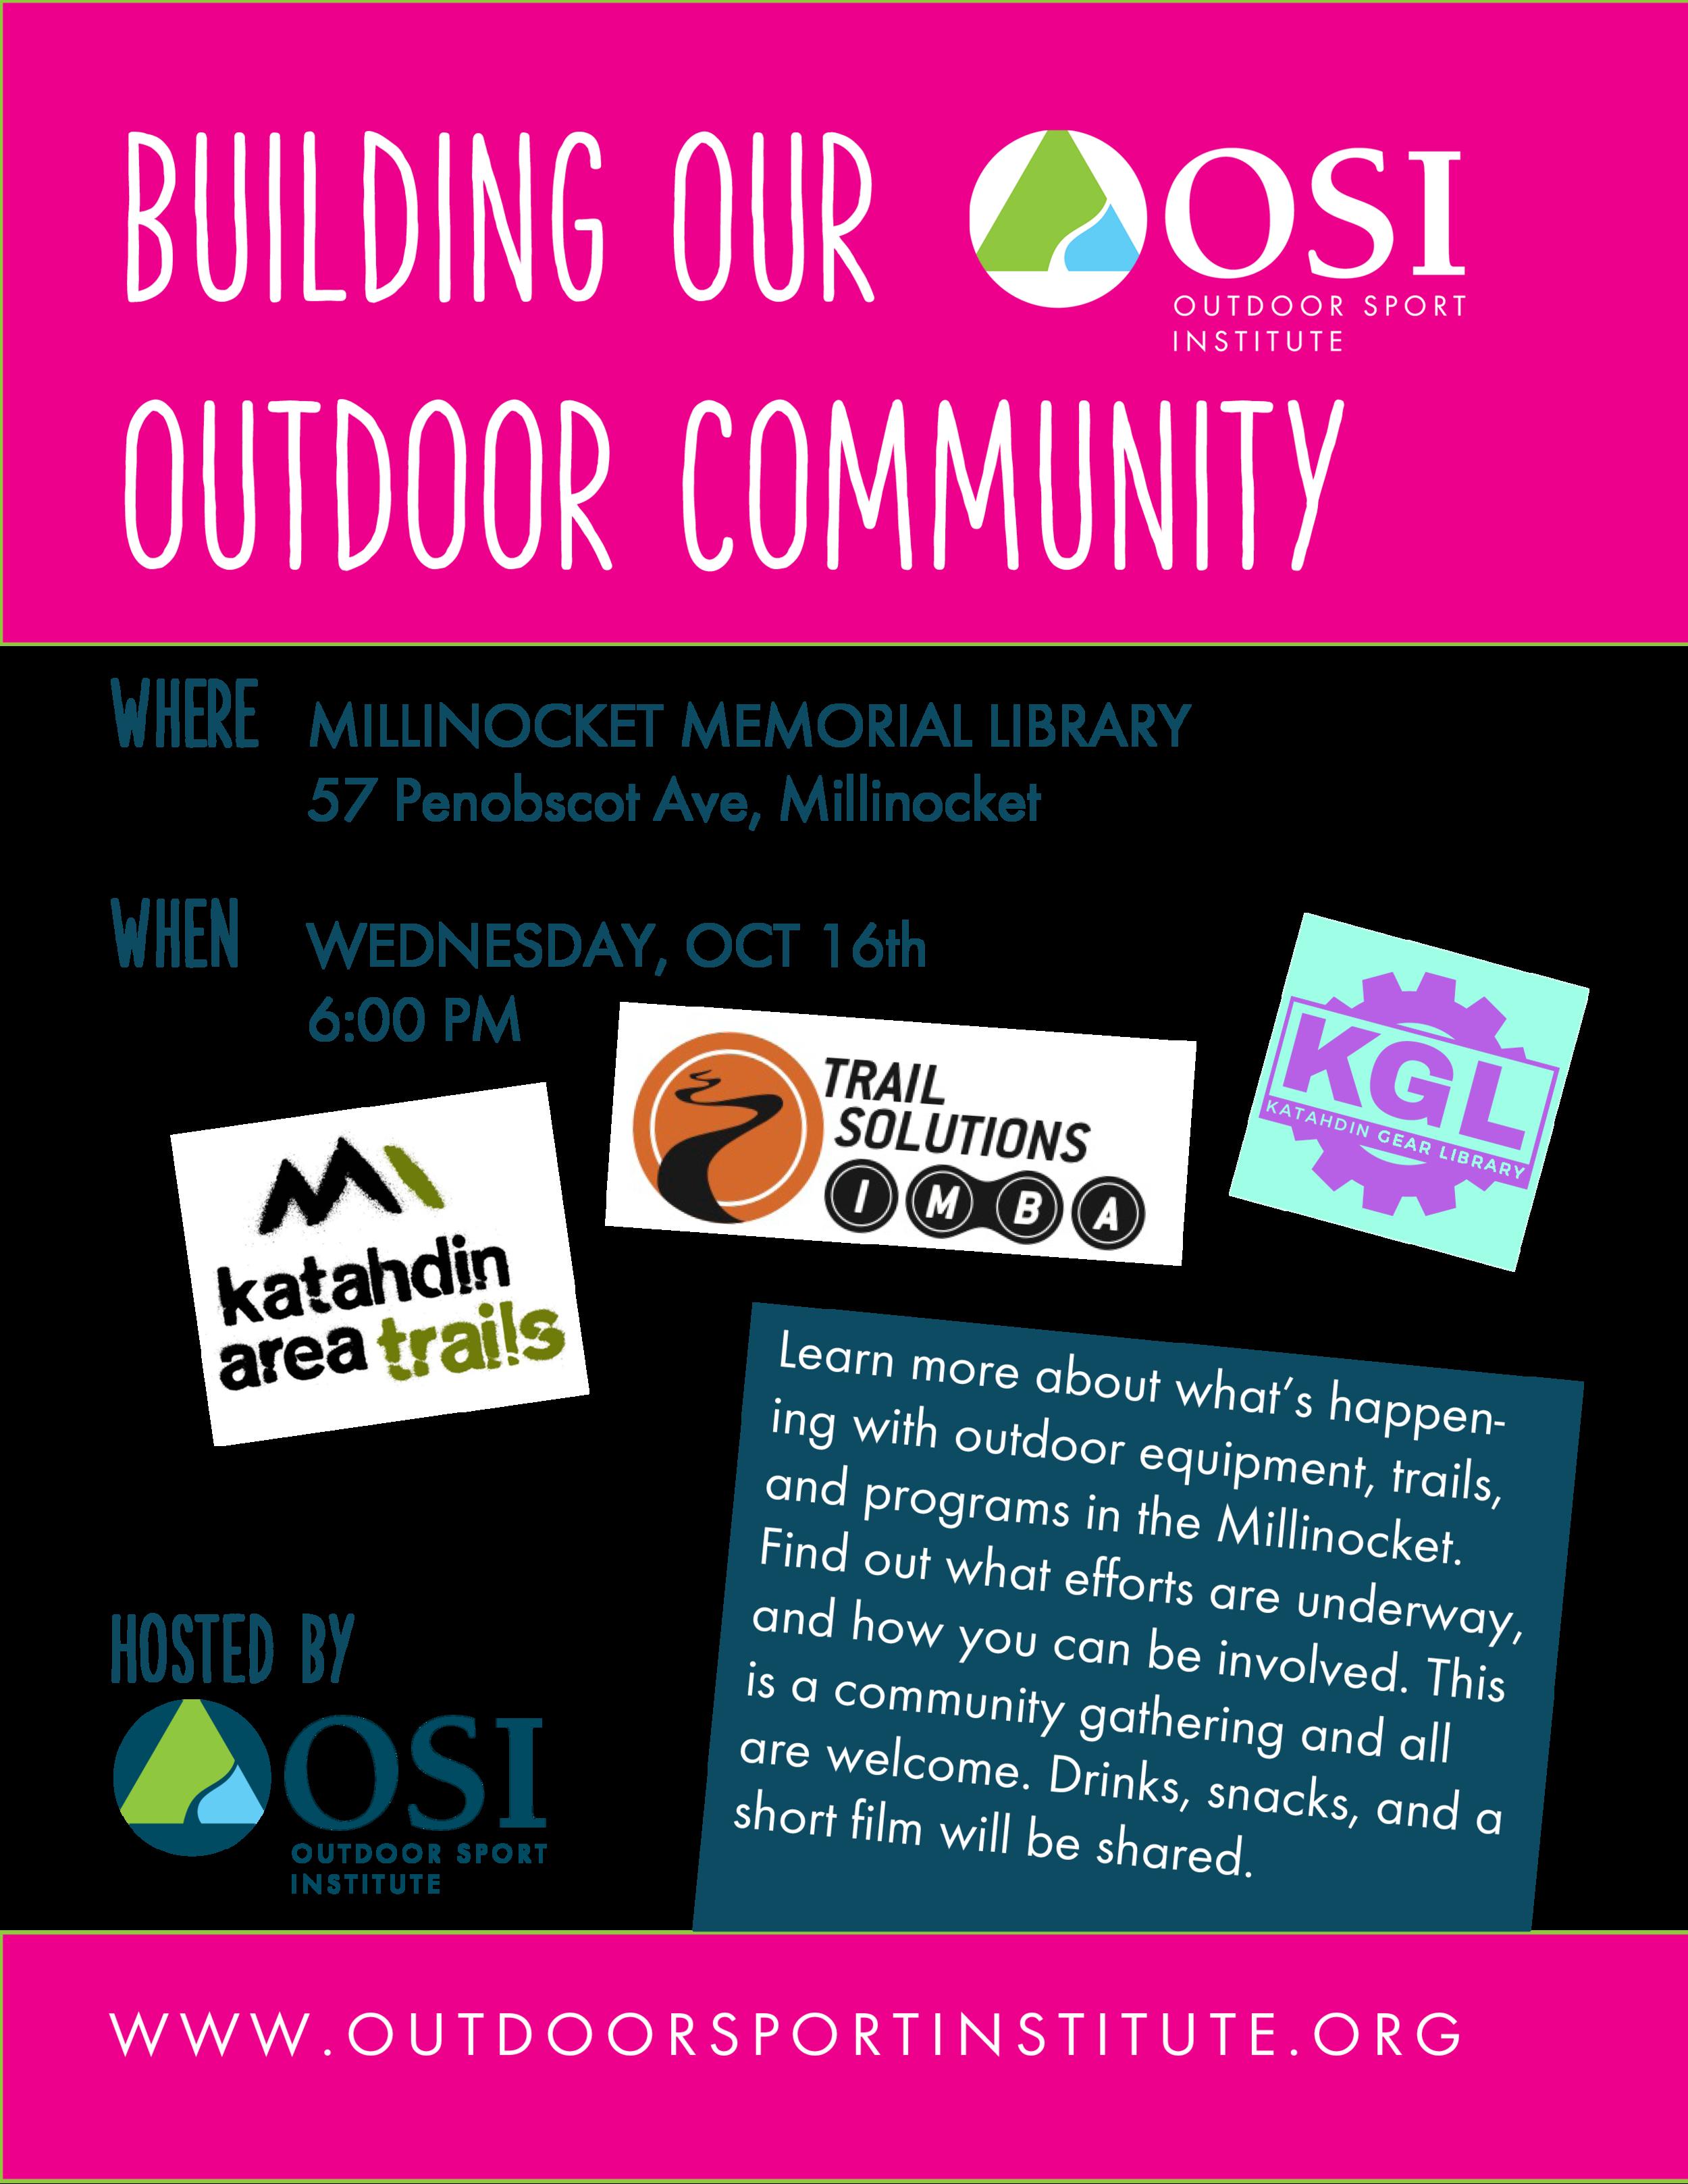 OSI Community Gathering Flyer 10.16.19.png